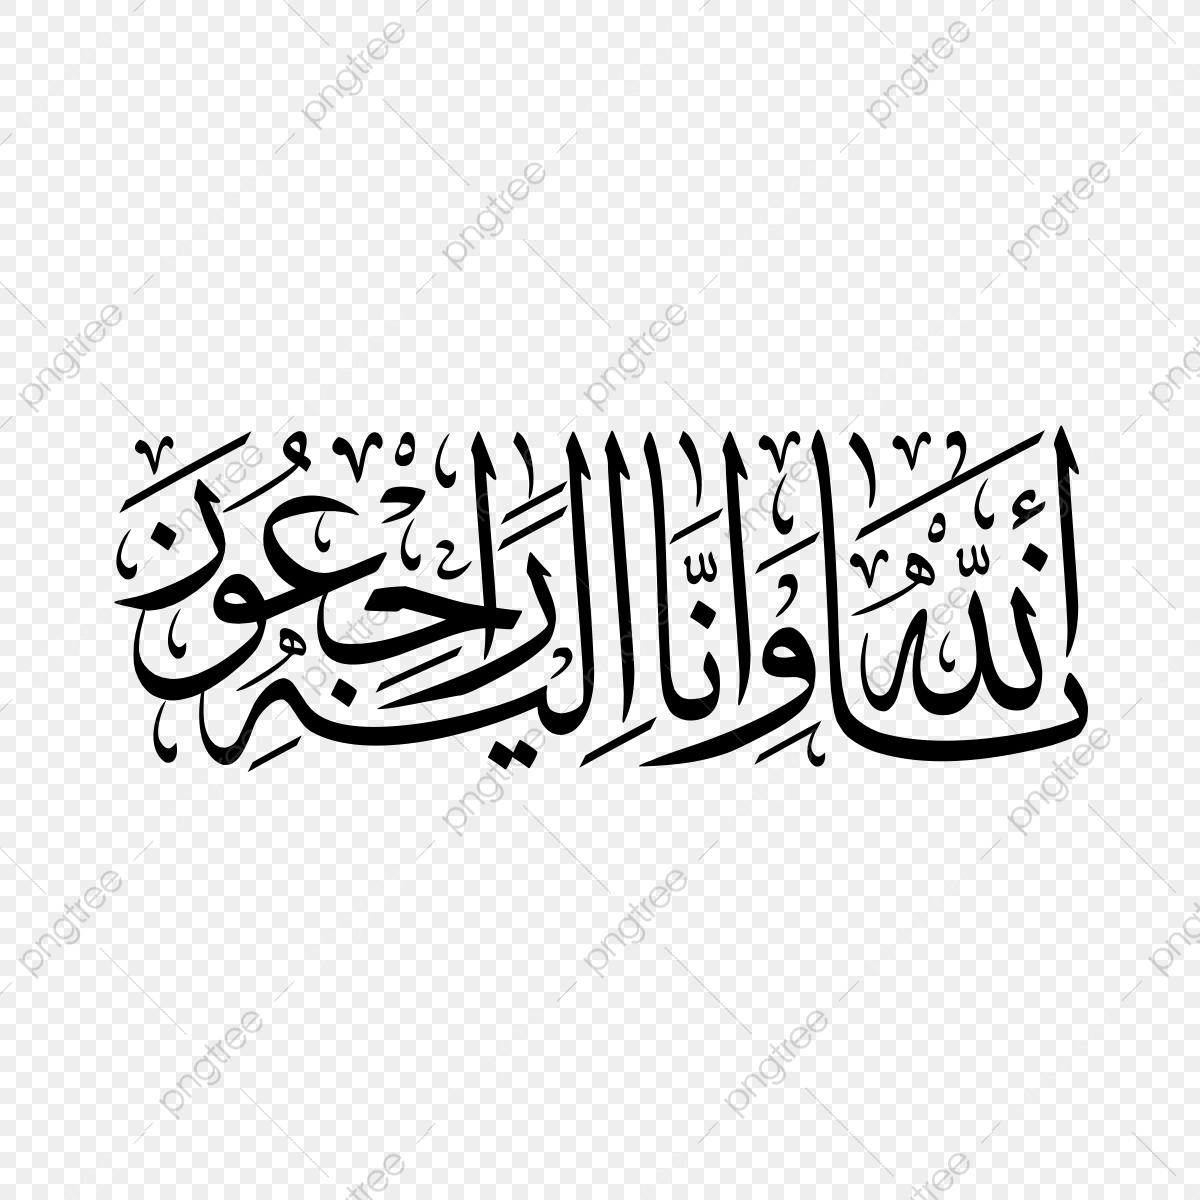 Arabic Calligraphy, Arabic Calligraphy Quran Phrase, Arabic.